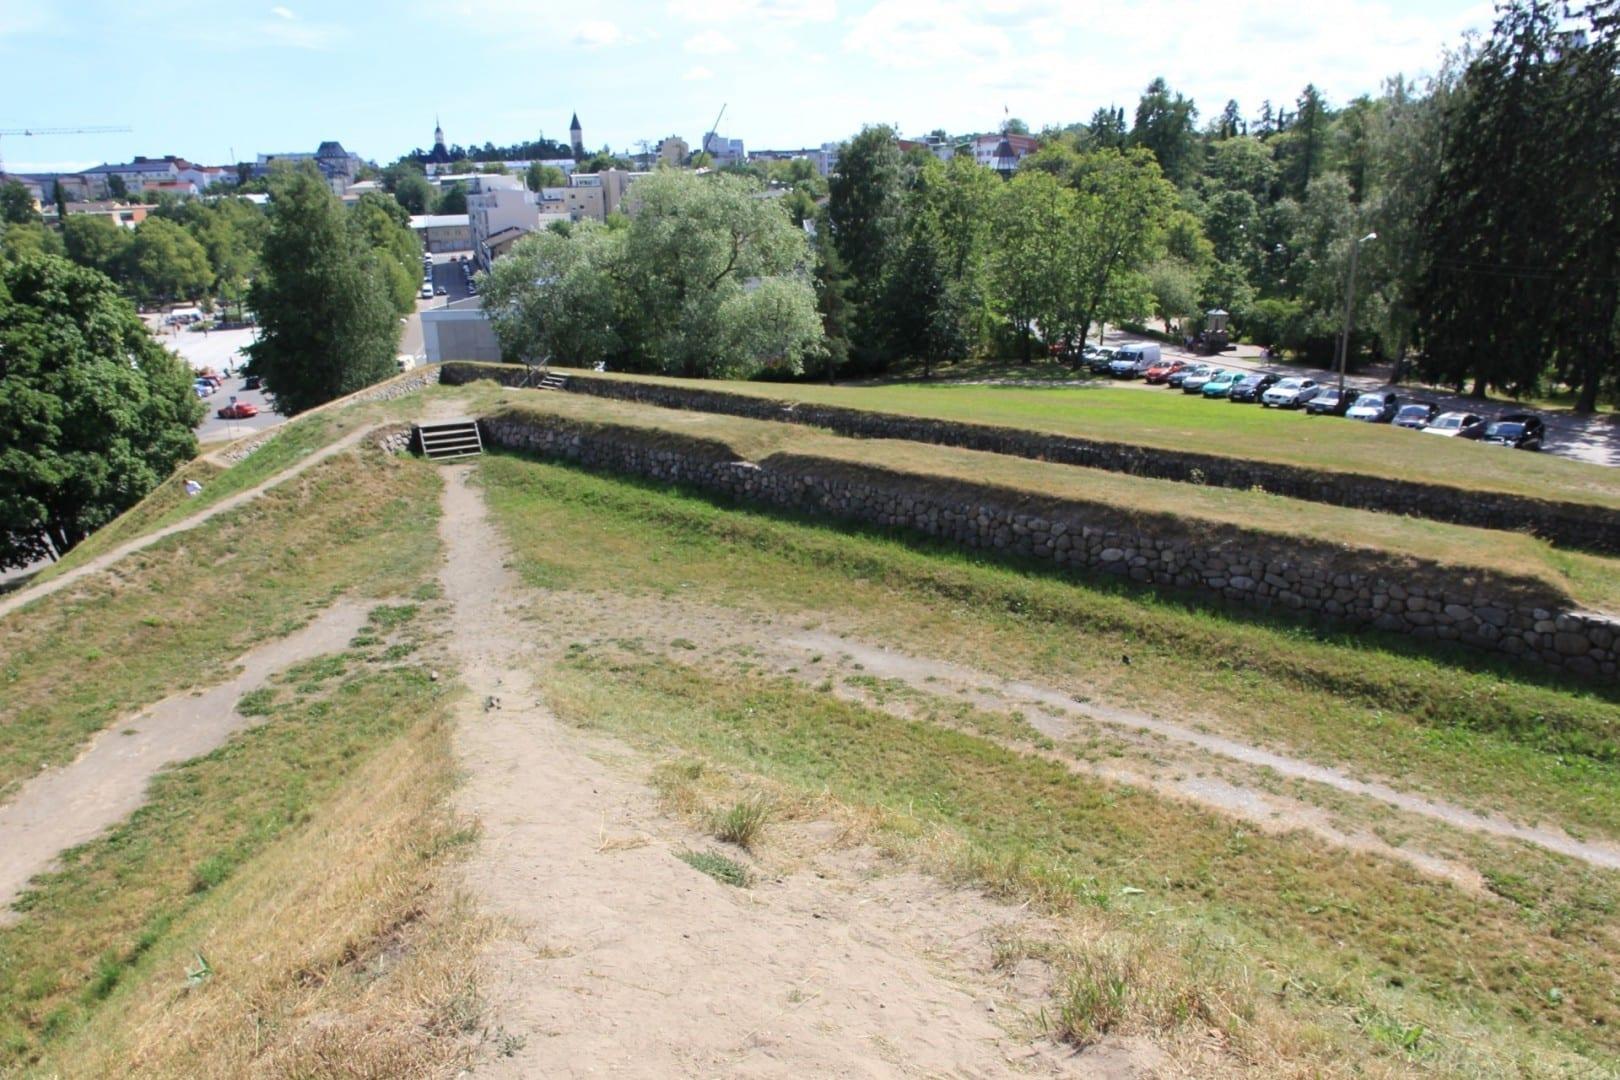 Los muros de la fortaleza de Lappeenranta Lappeenranta Finlandia